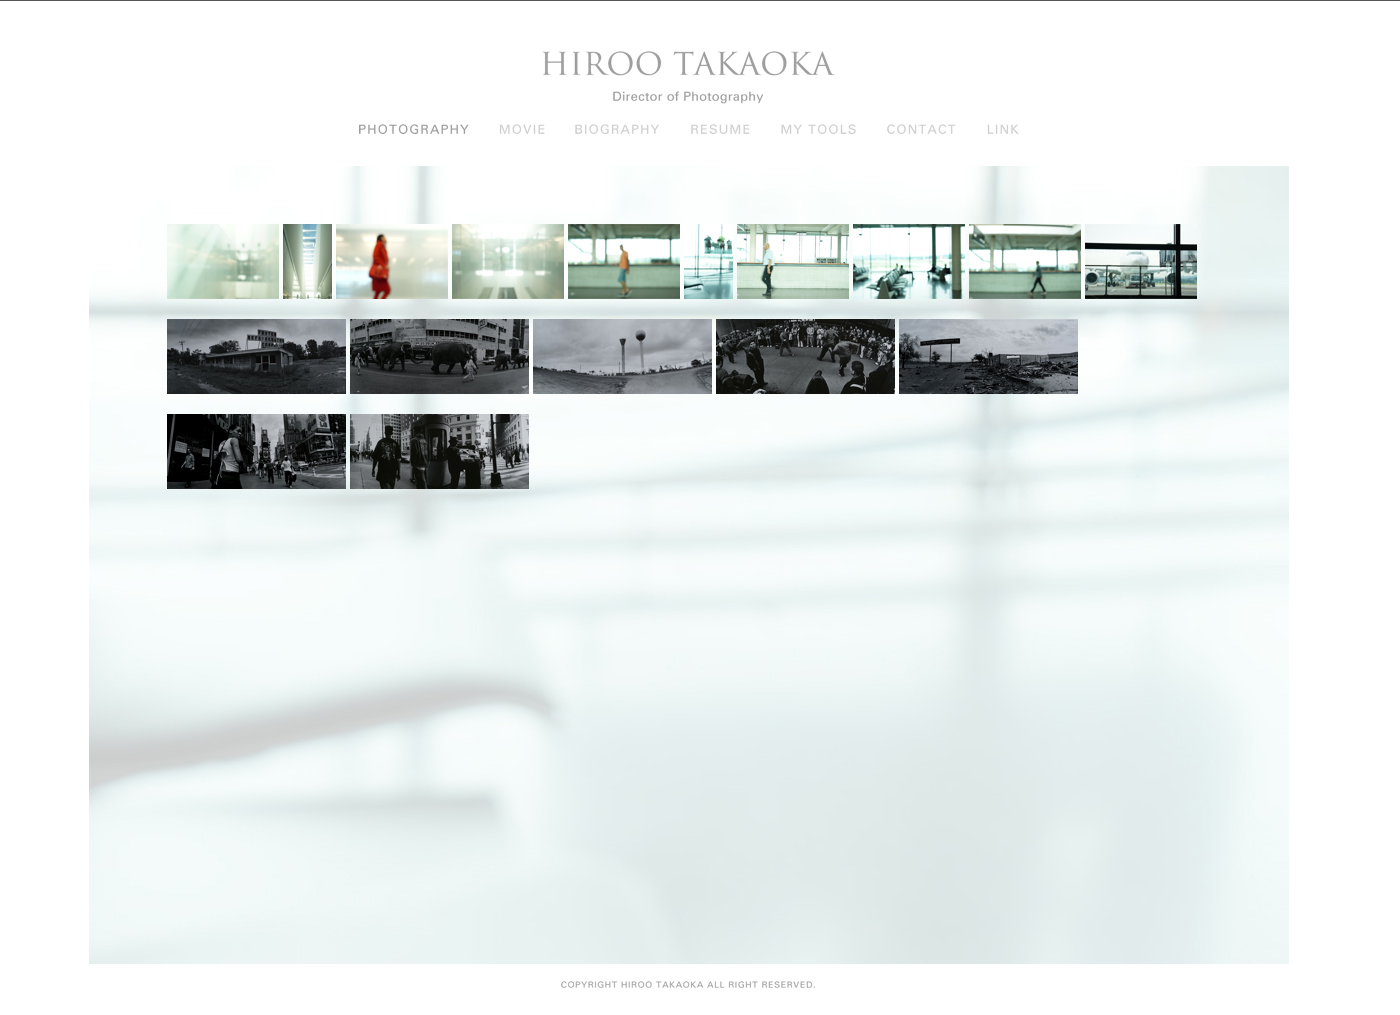 and_Design_HirooTakaoka_web_02.jpg